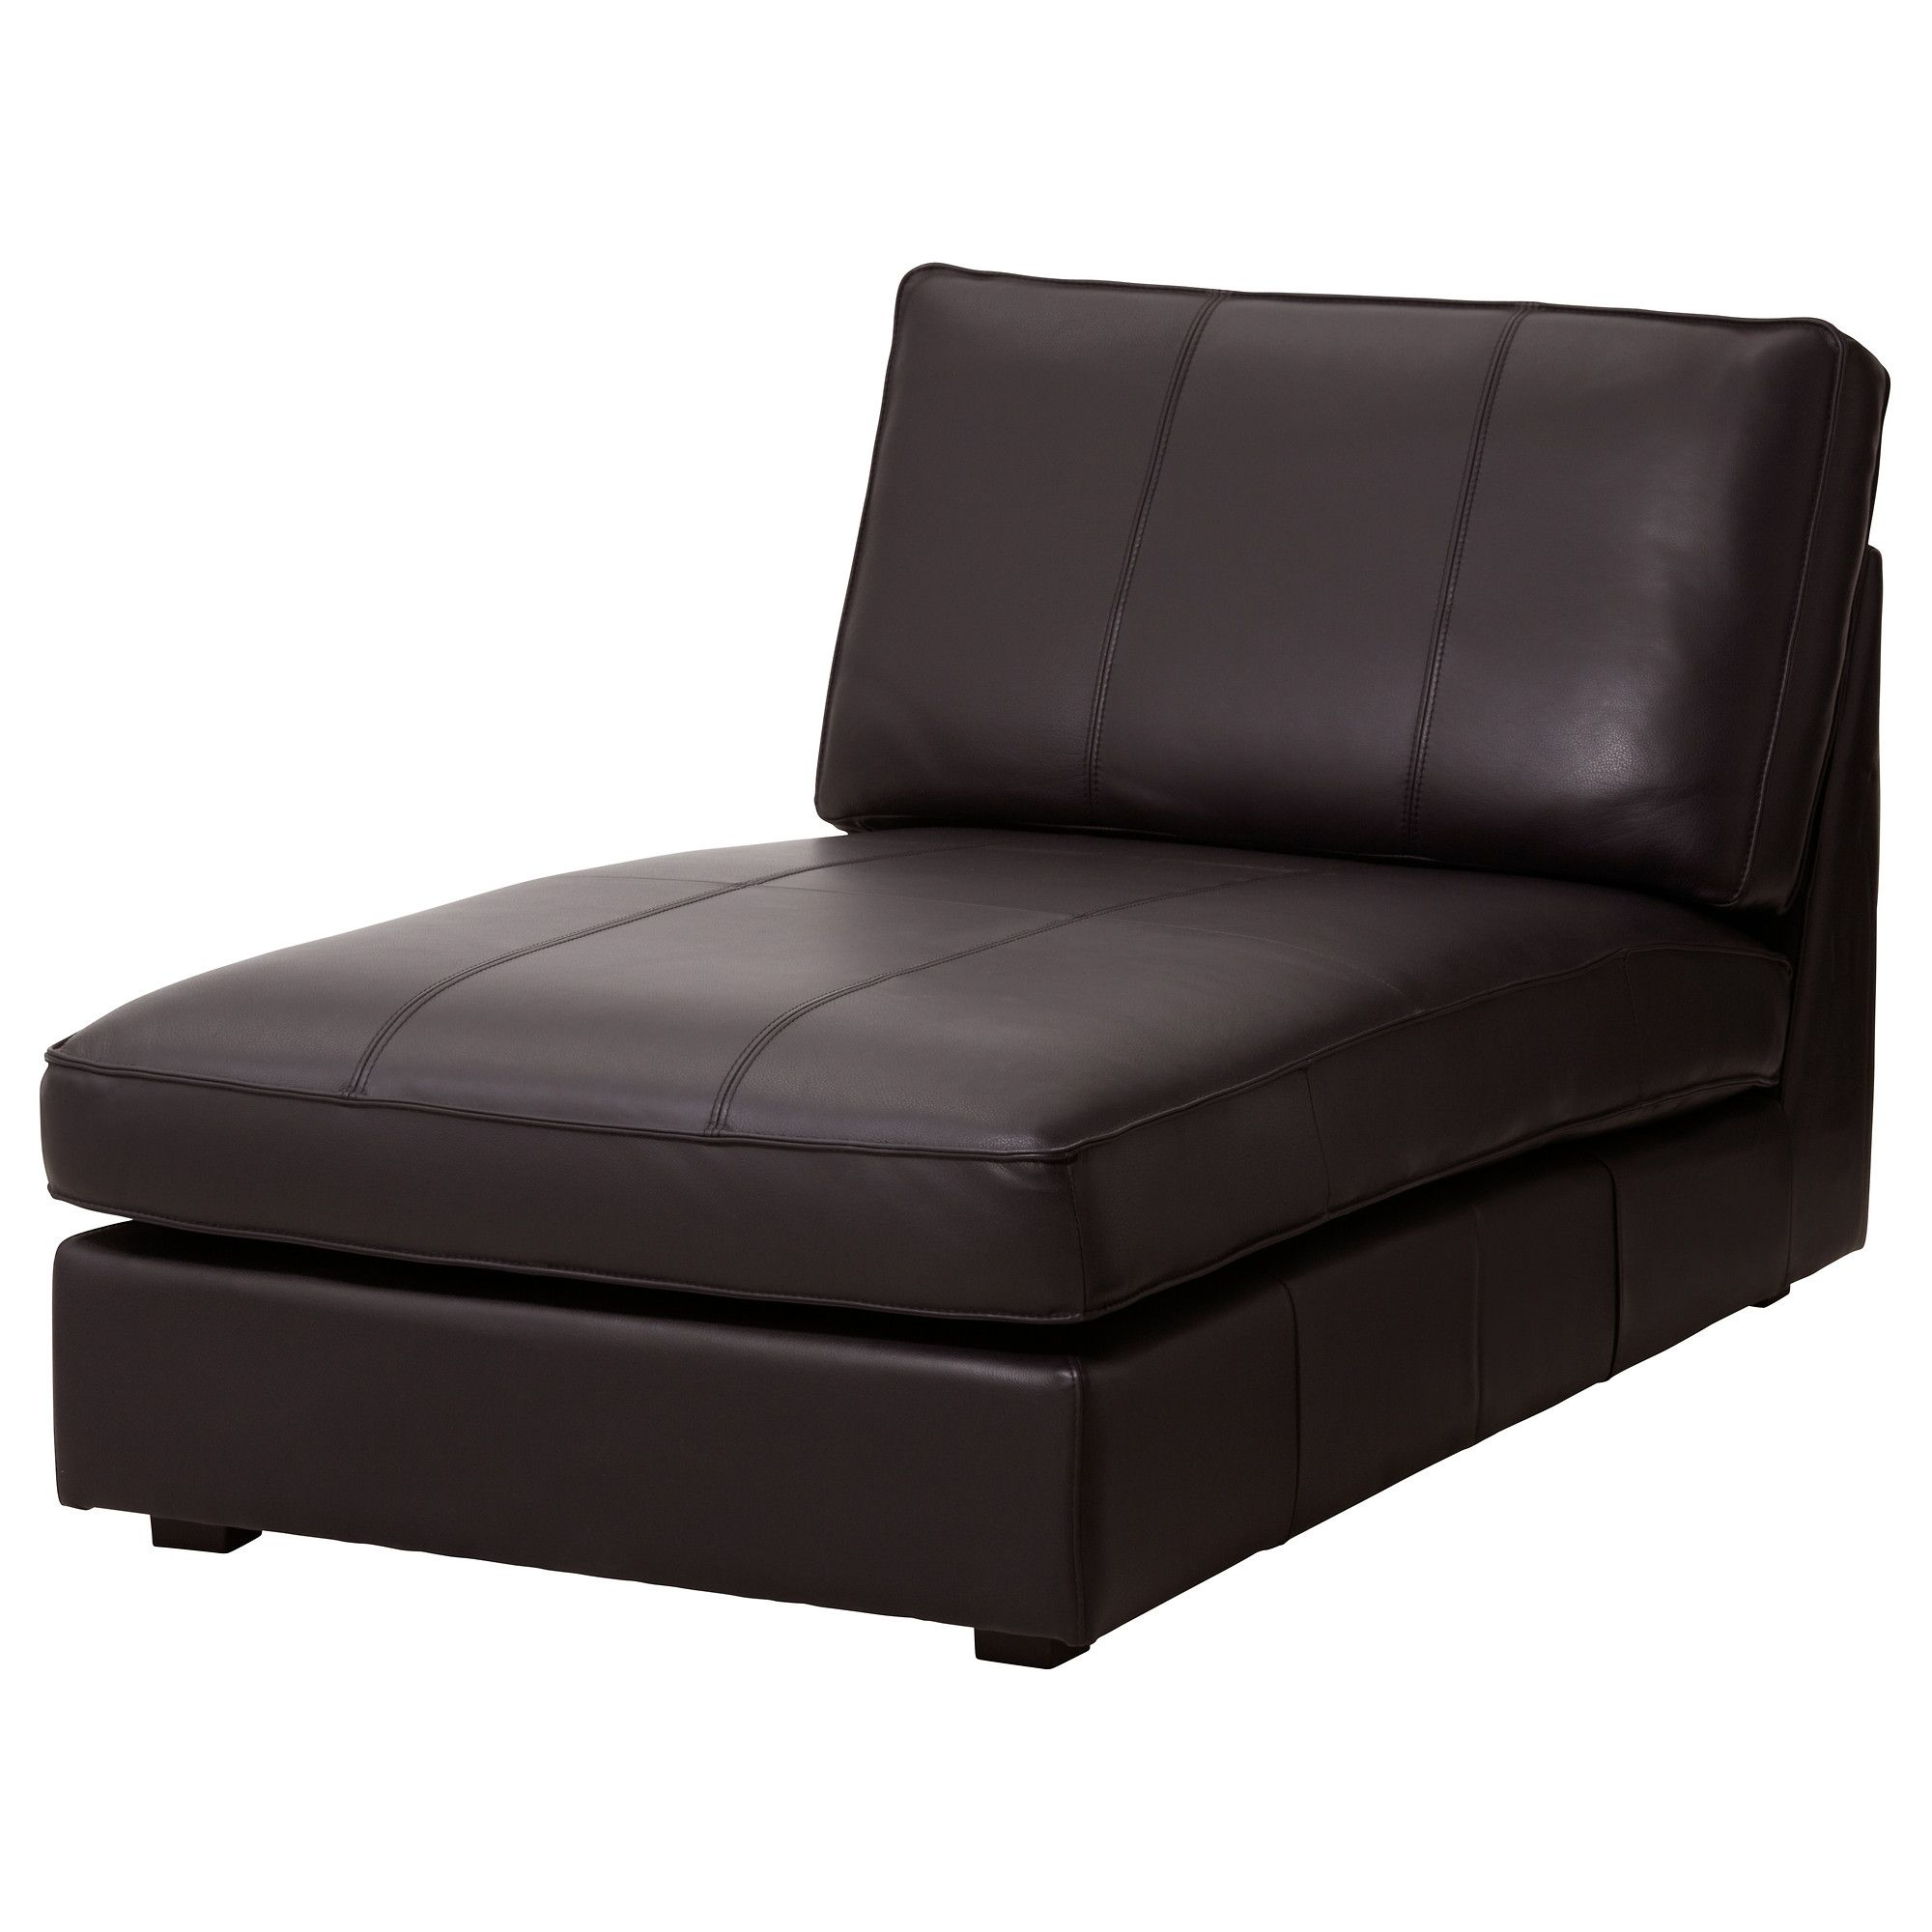 Ikea Kivik Chaise Grann Bomstad Dark Brown Products